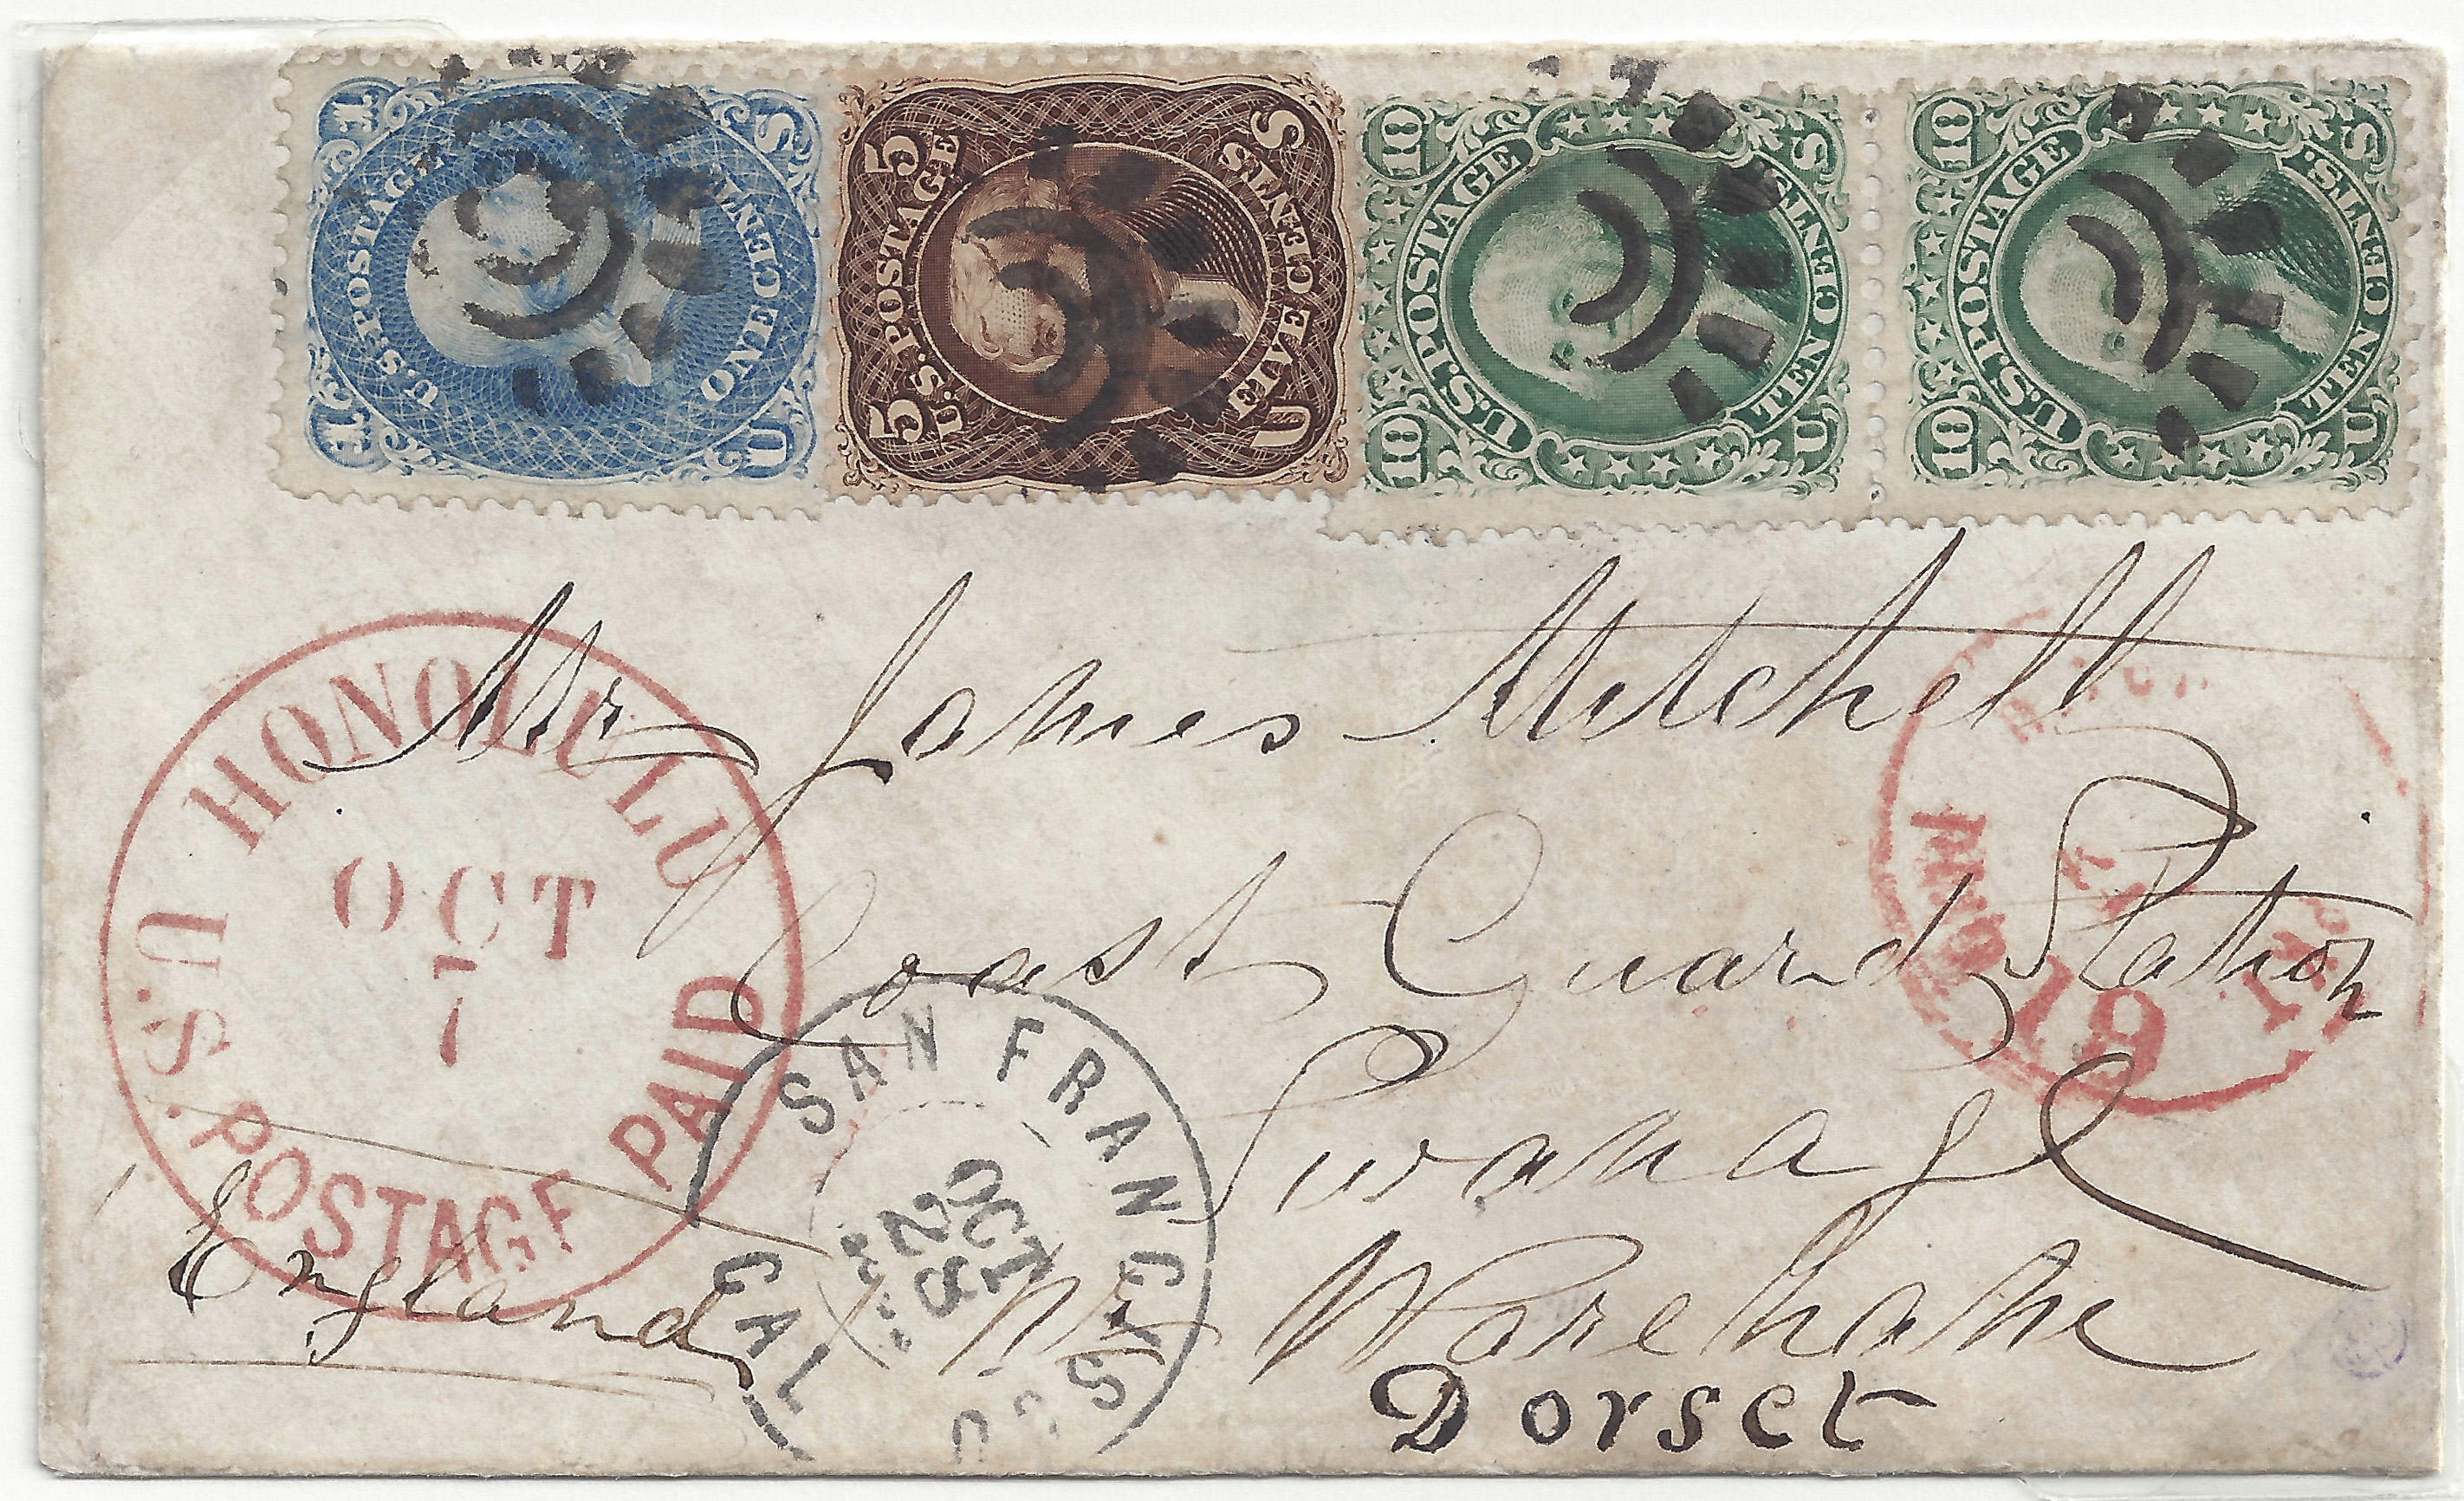 Suburban 20140425 5 23 Honolulu Oct 7 1865 26c Paying 2c Ship Fee + 24c To England (63 68x2 76)